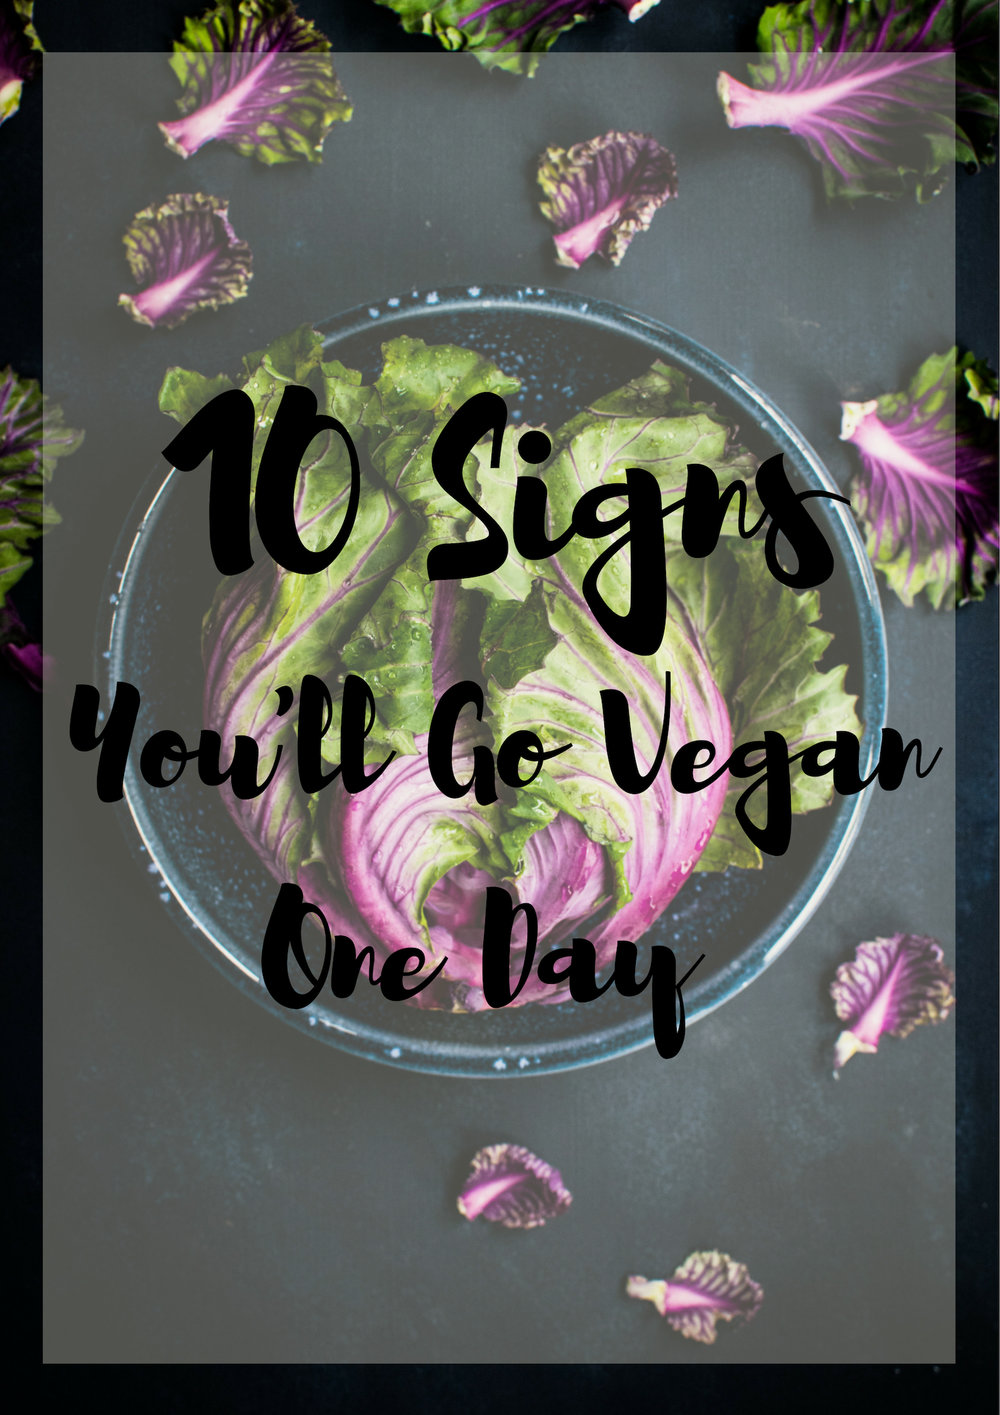 10 Signs You'll Go Vegan One Day.jpg